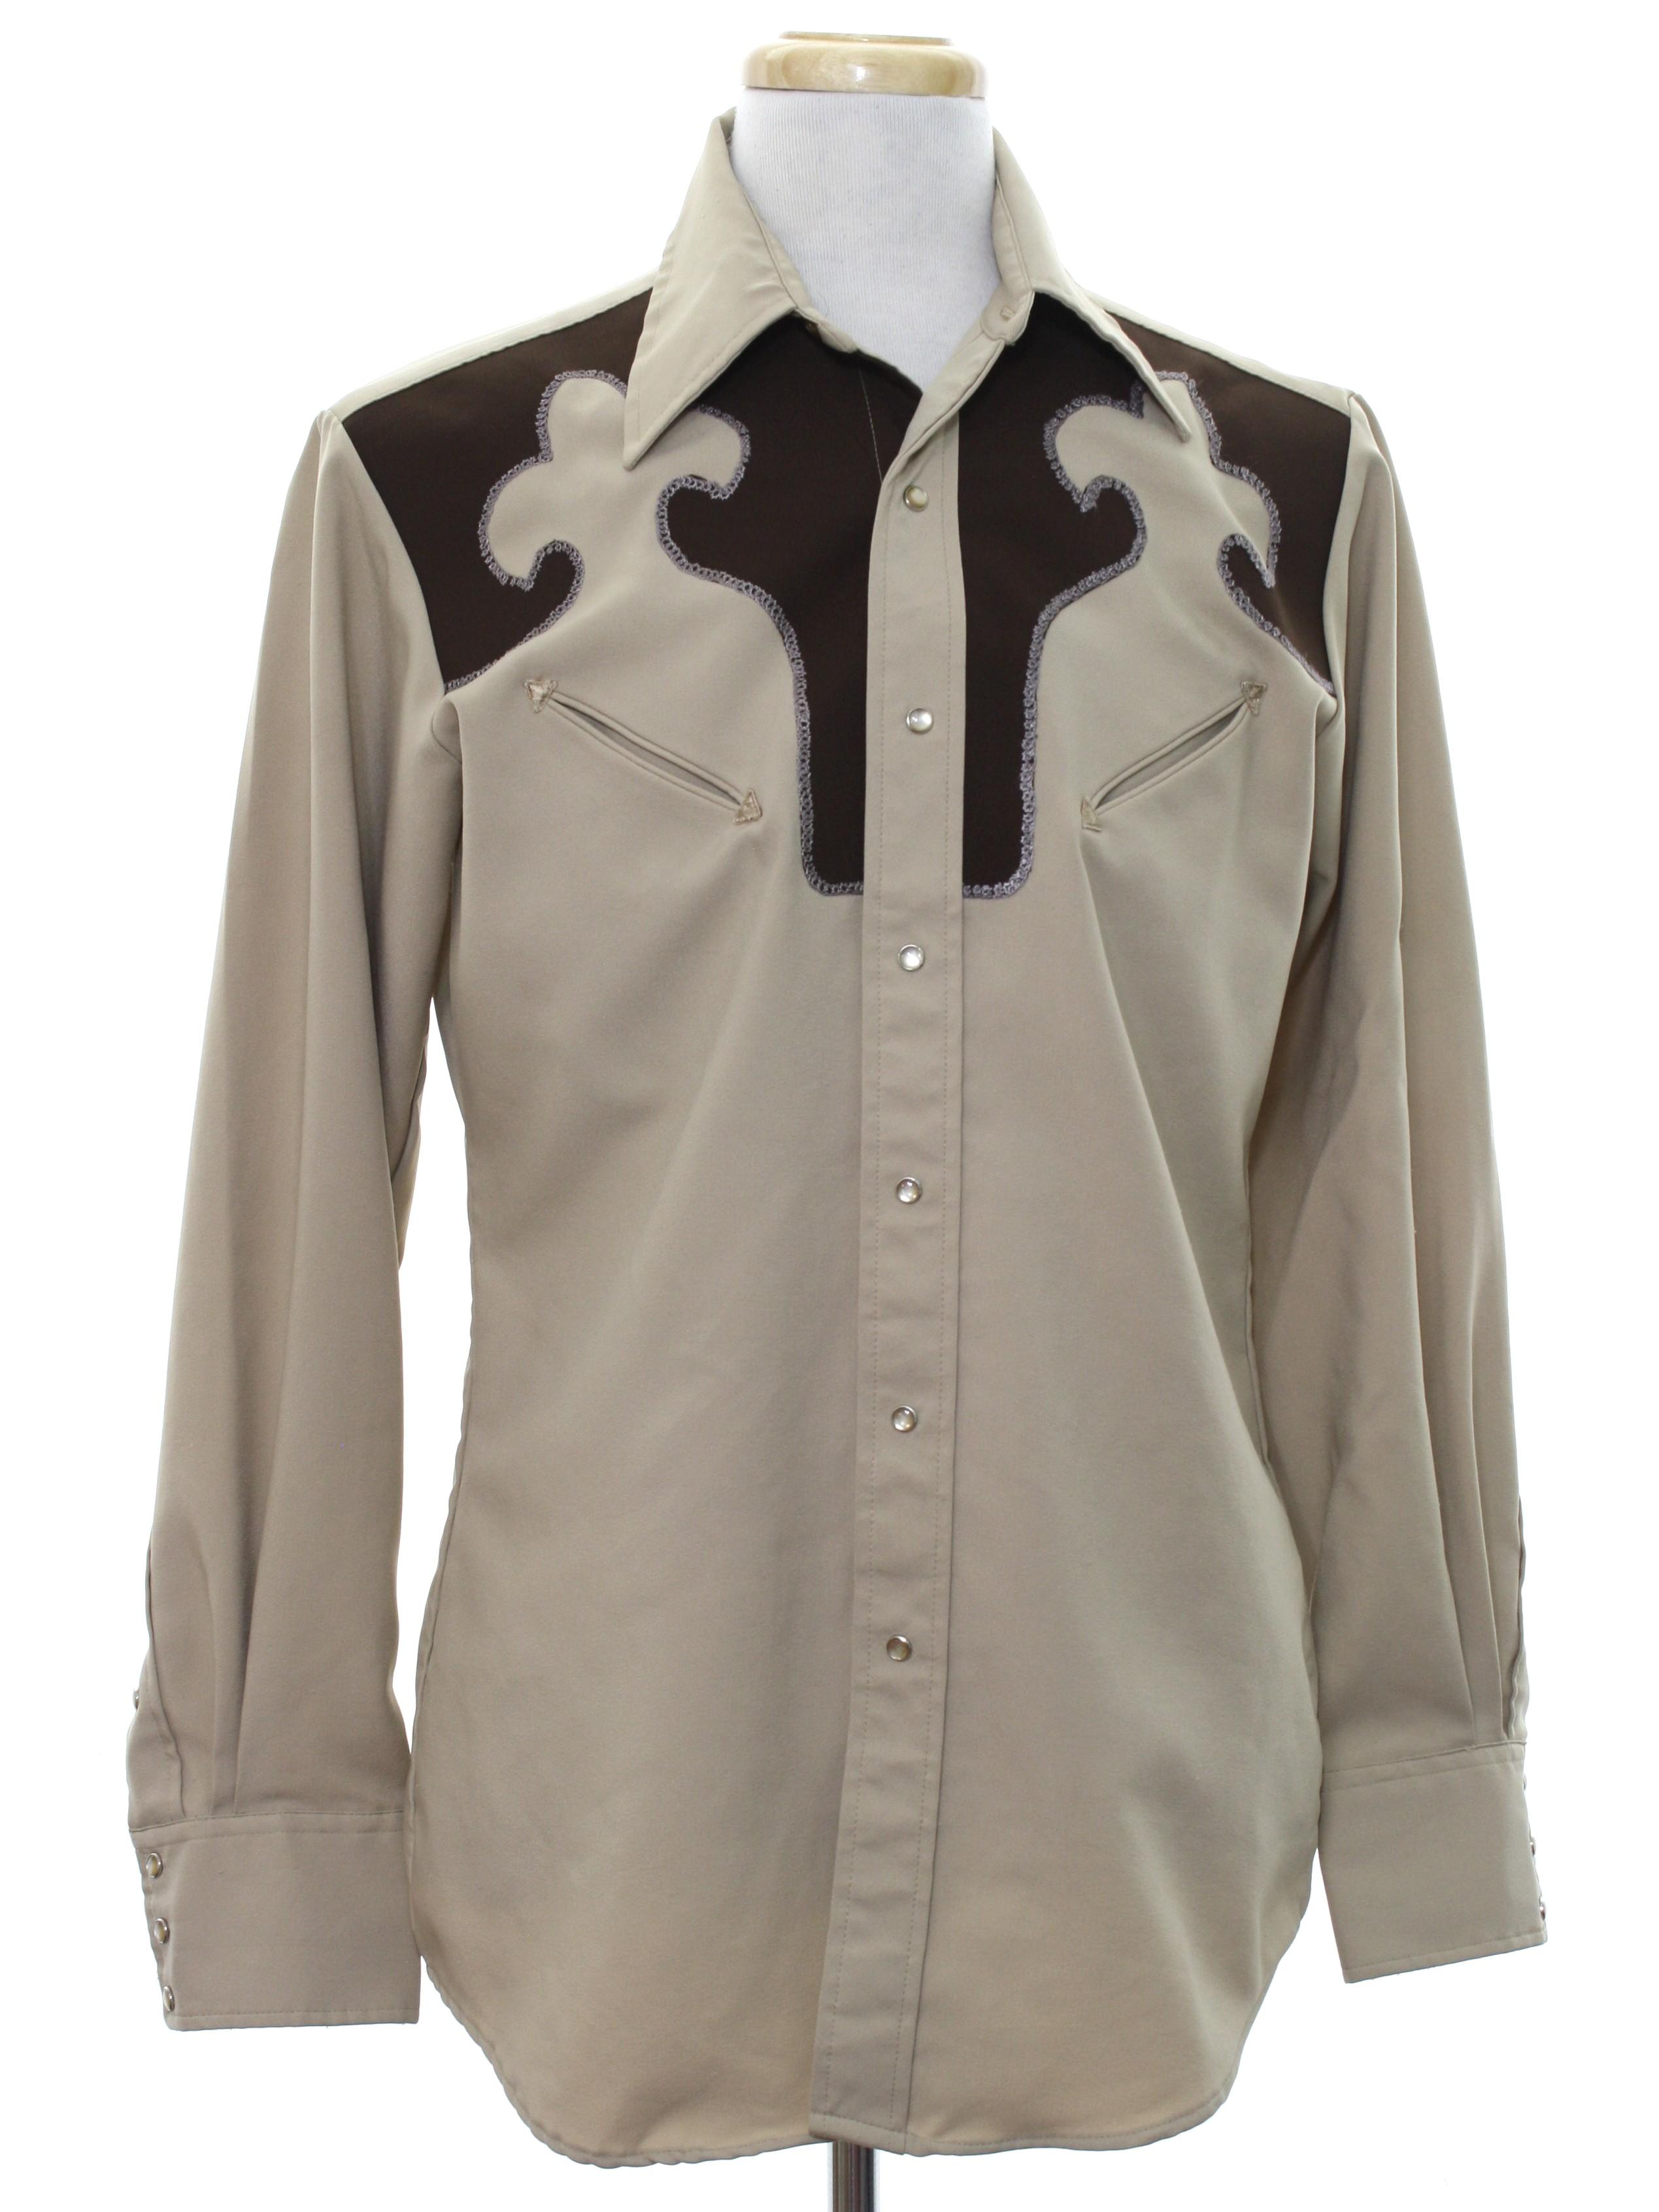 western shirts made in usa